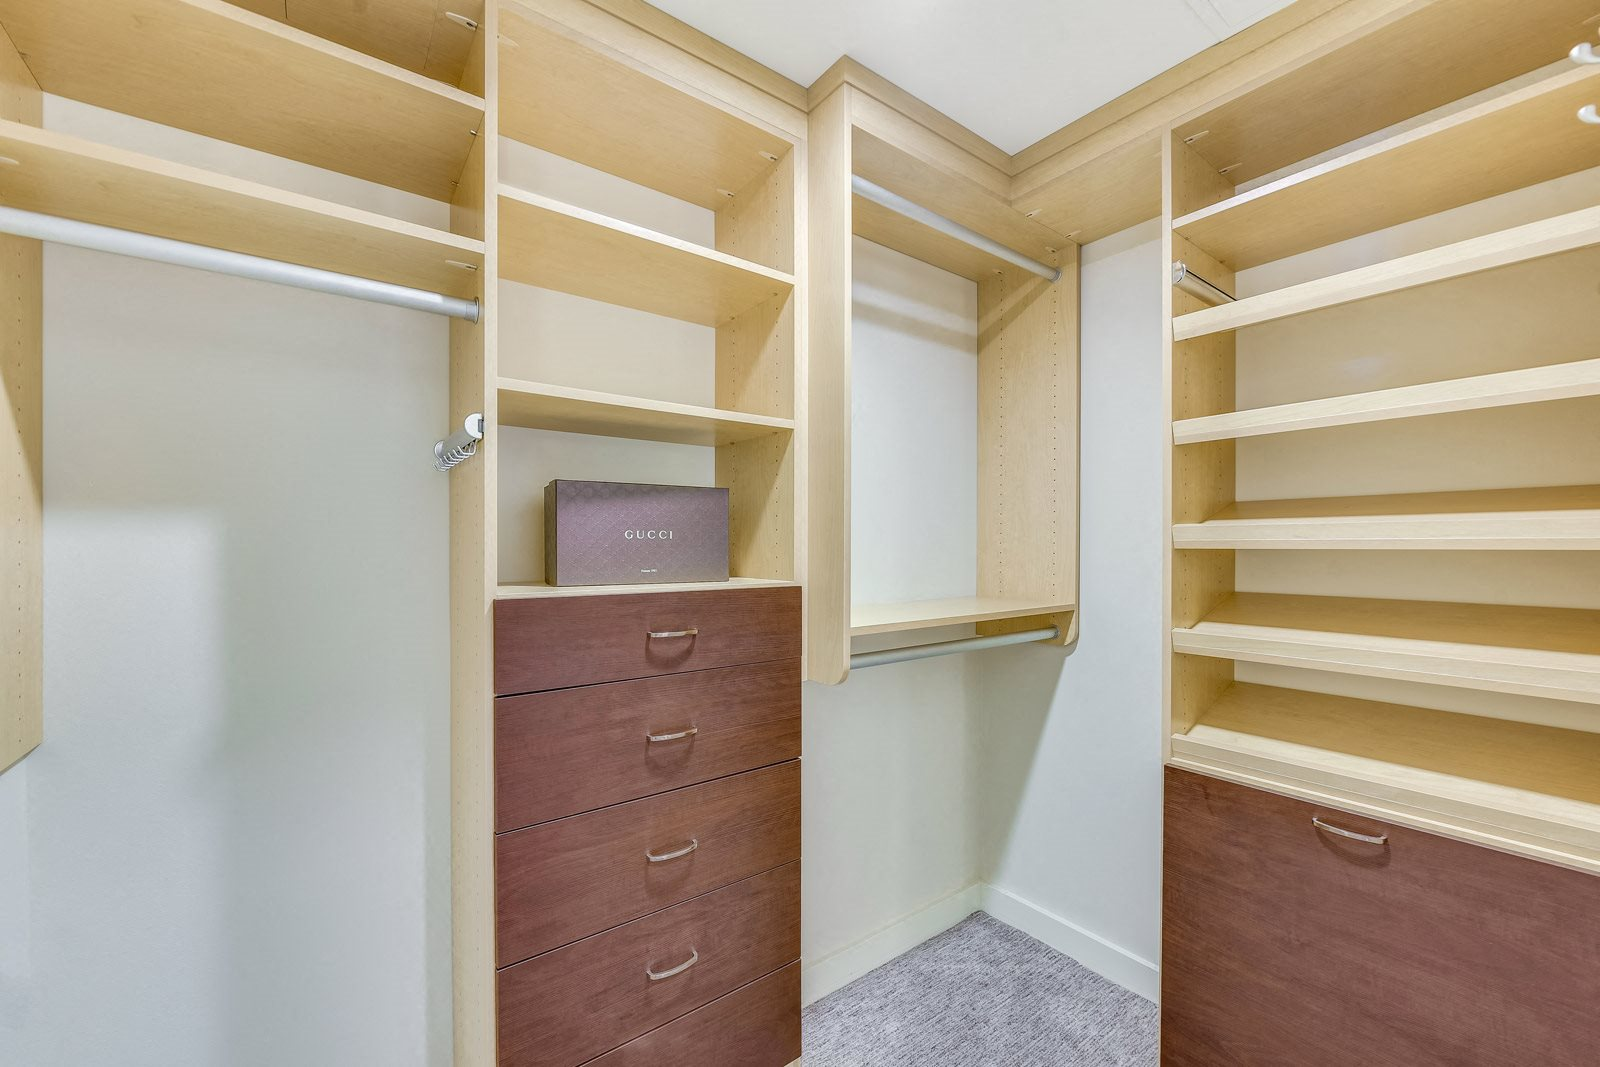 Walk-In Closets at The Martin, 2105 5th Ave, WA